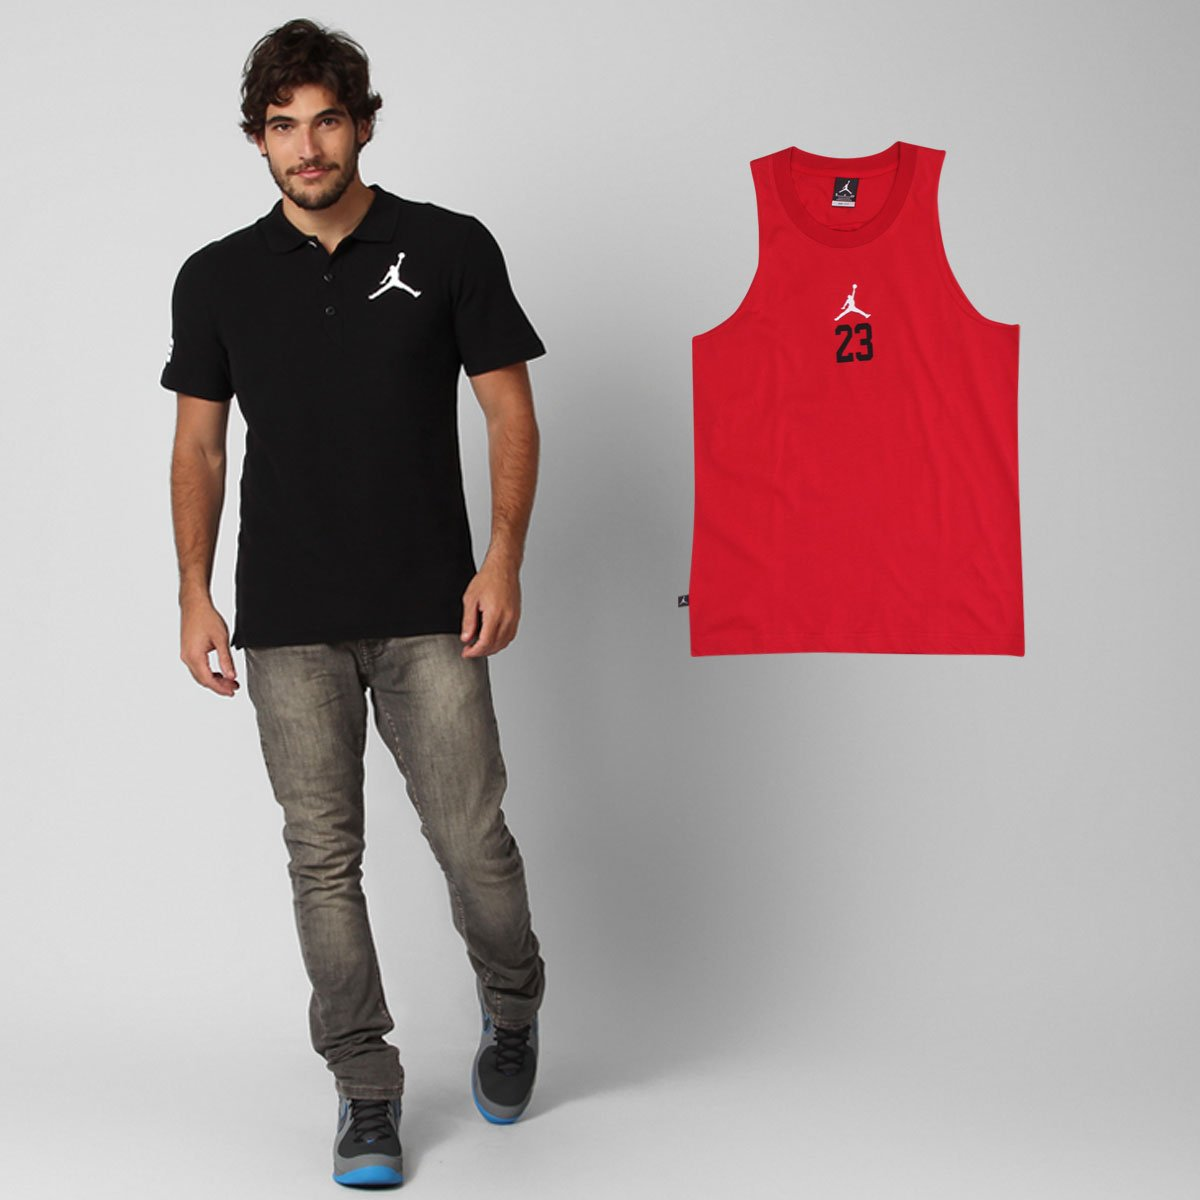 ffb18b072fa52 Kit Nike - Camisa Polo Nike Jumbo Jordan + Camiseta Regata Nike Jordan Rise  - Compre Agora